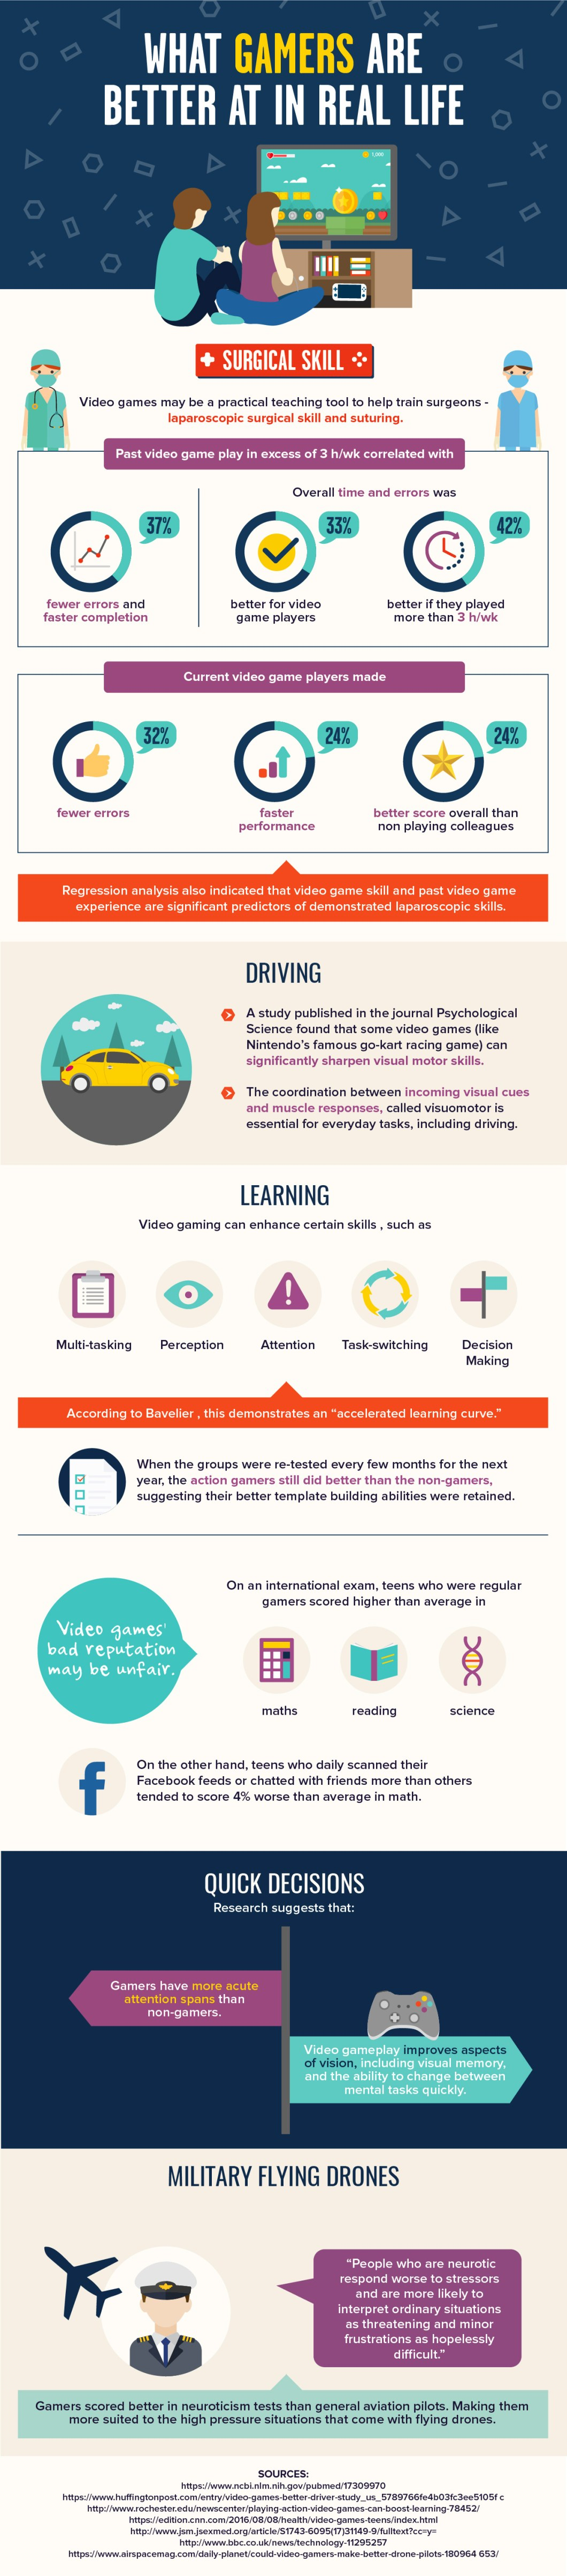 How Gaming Skills Translate into Key Job Skills - Infographic